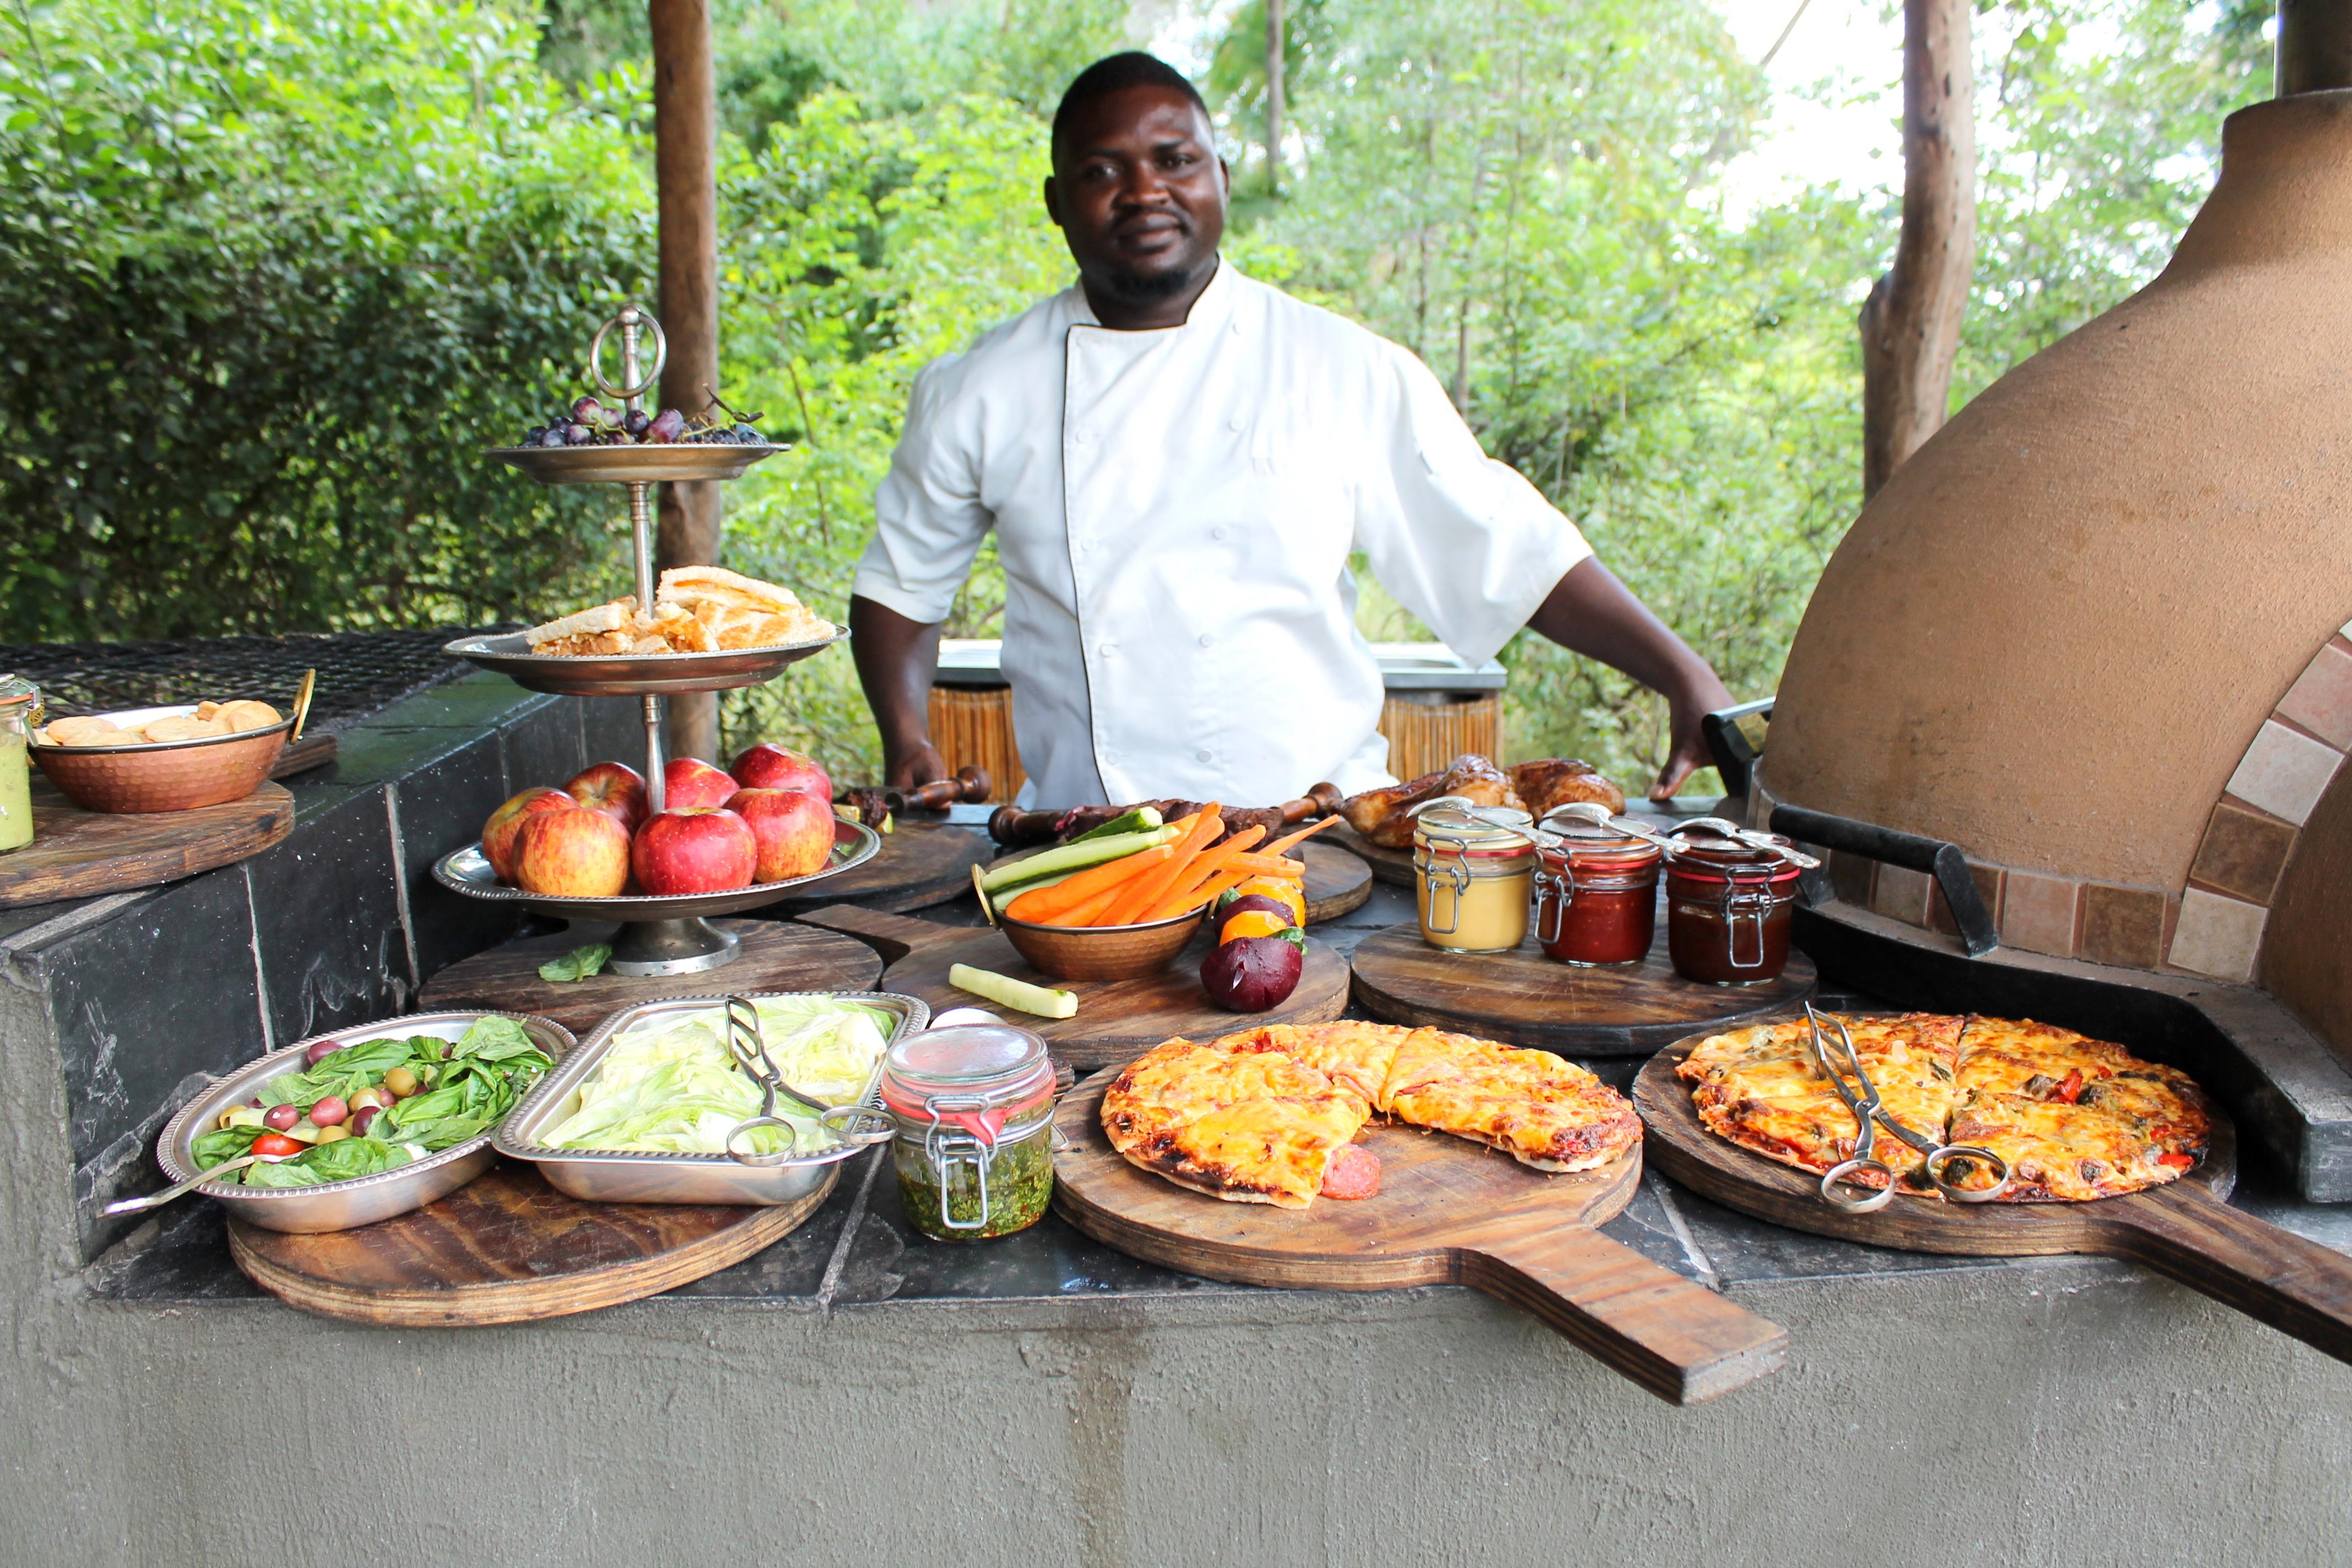 picnic-royalchundu-zambia-lustforthesublime